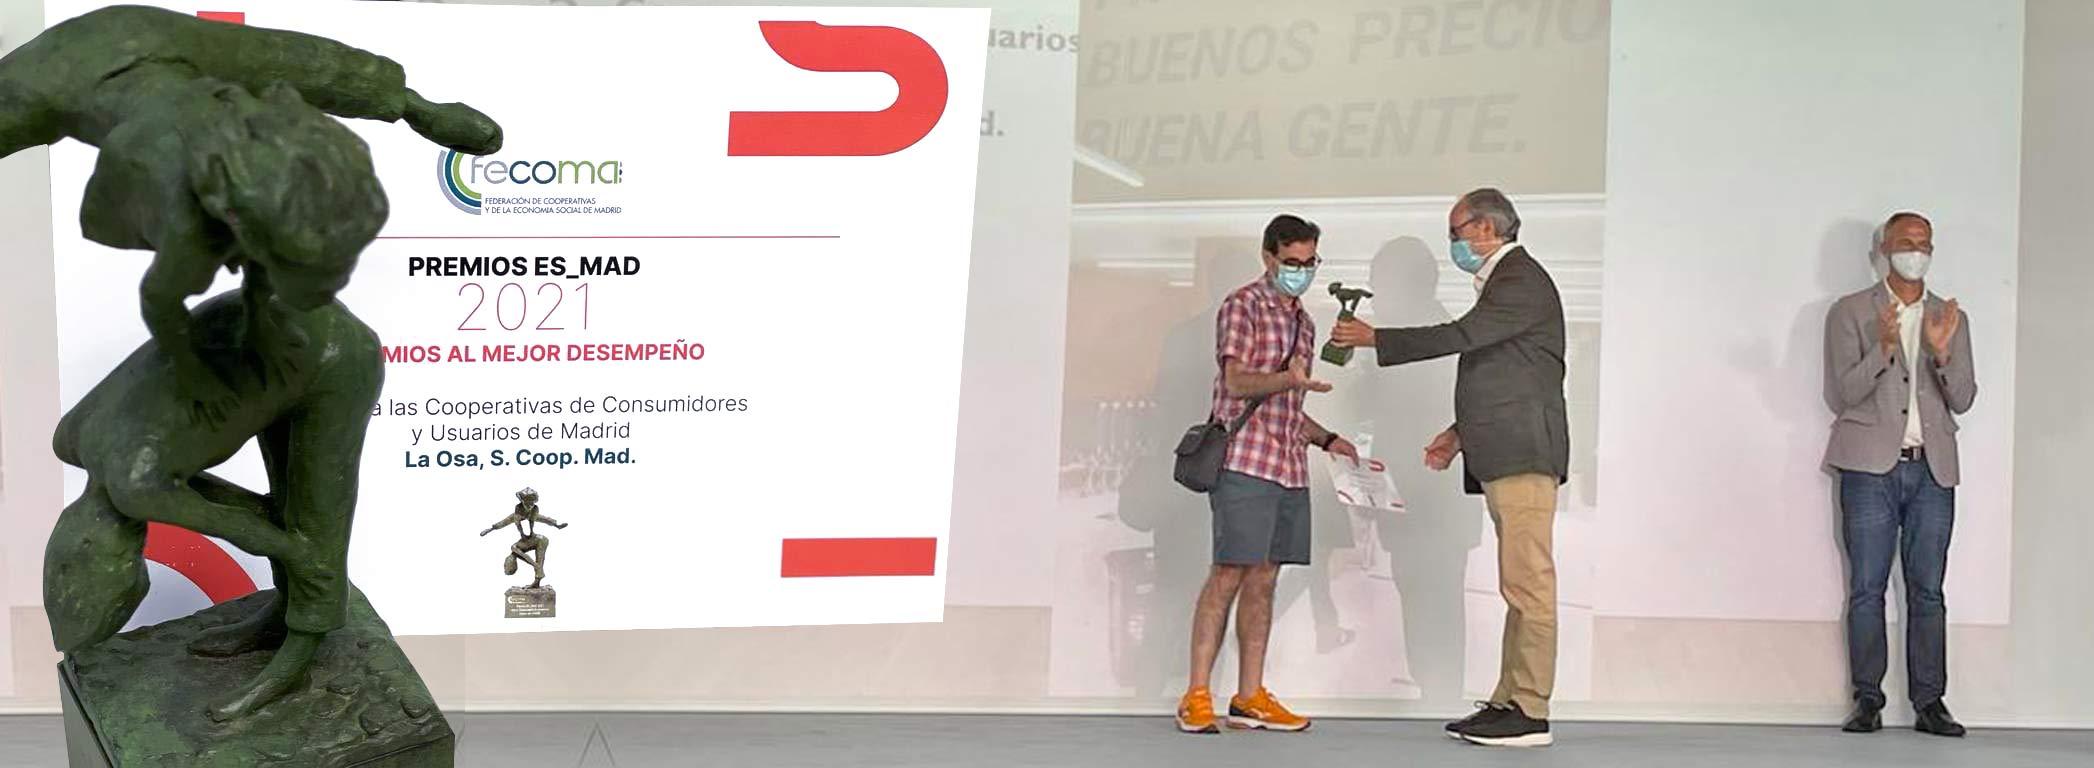 PremioES_MAD_FECOMA